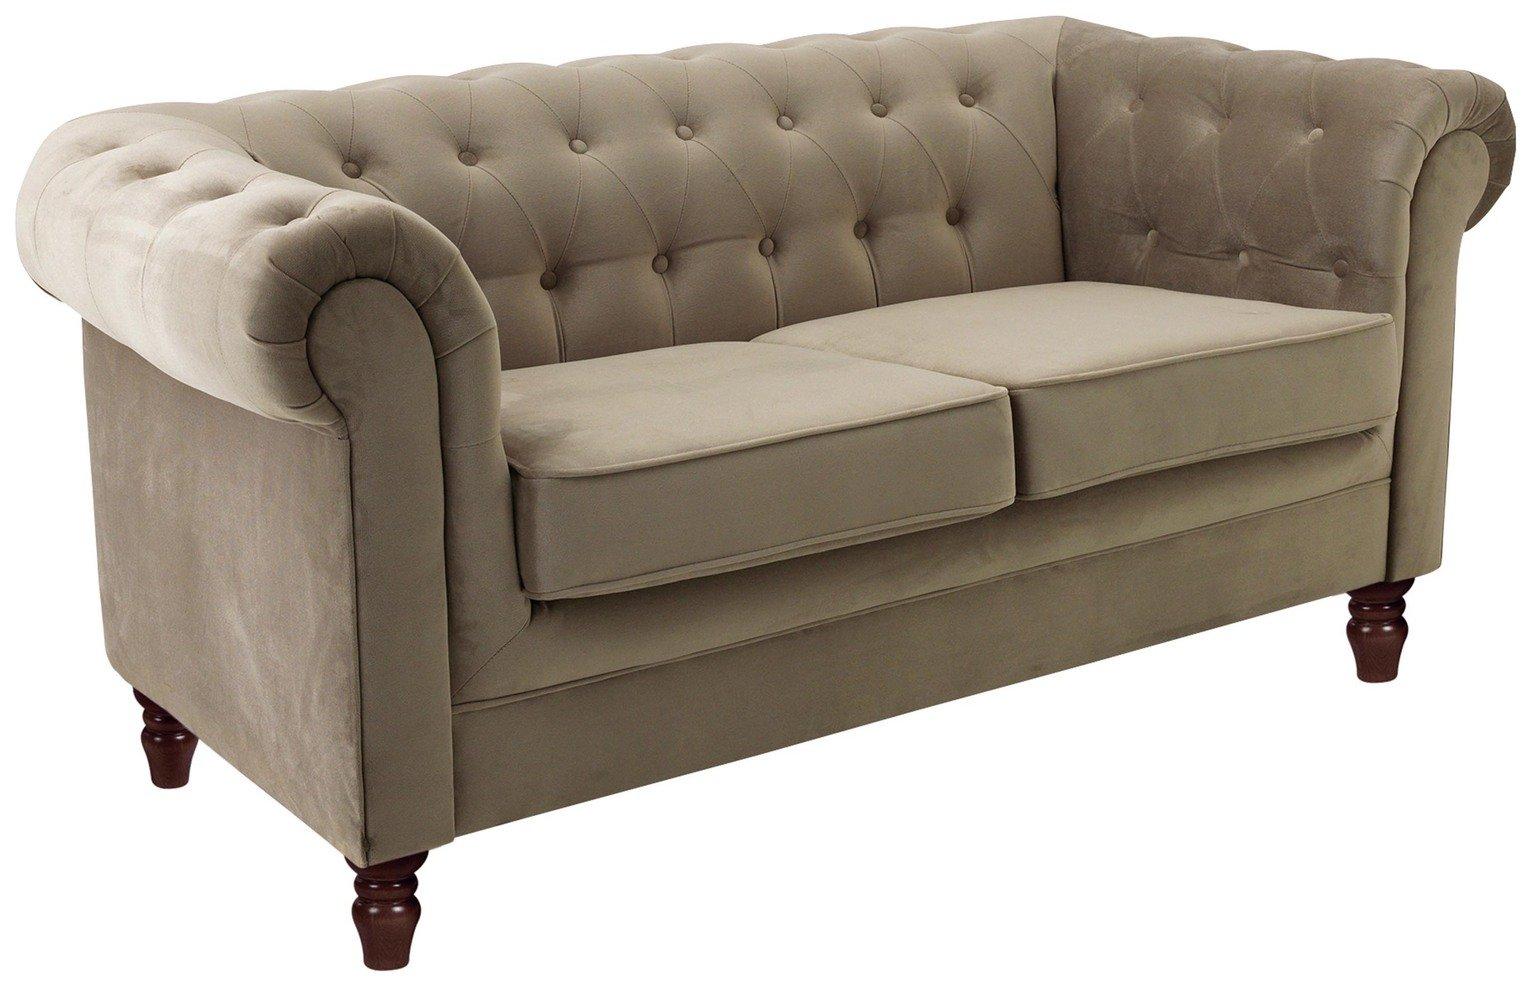 fabric chesterfield sofa argos wooden indian design